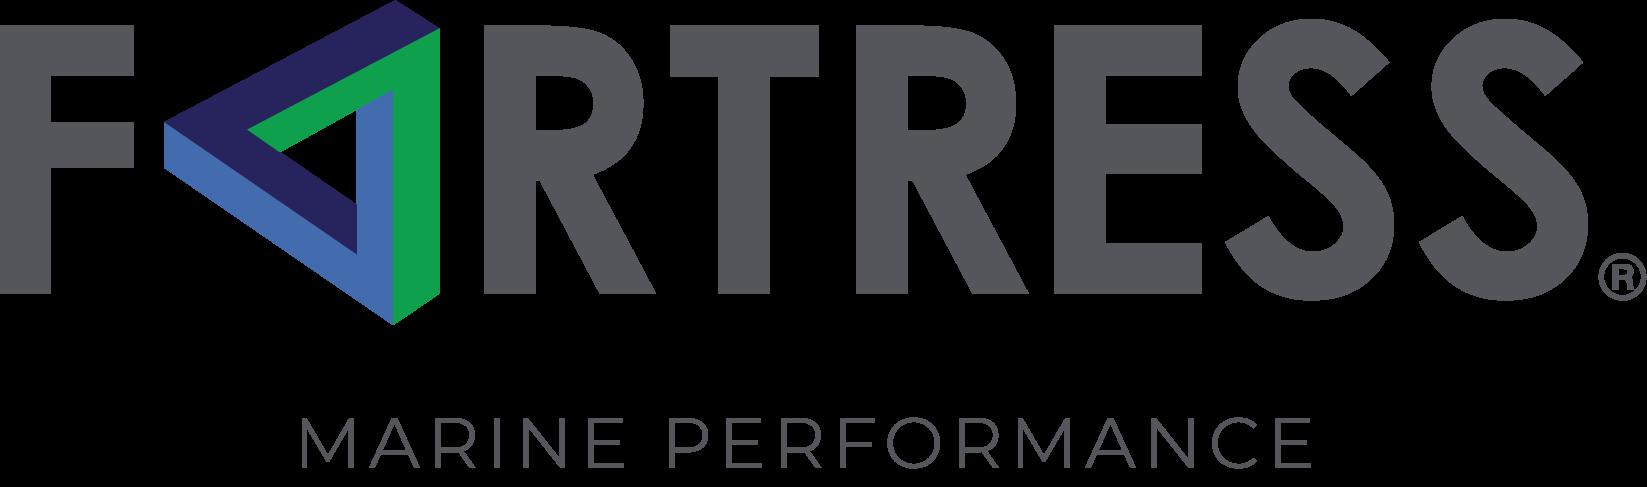 Fortress Marine Logo